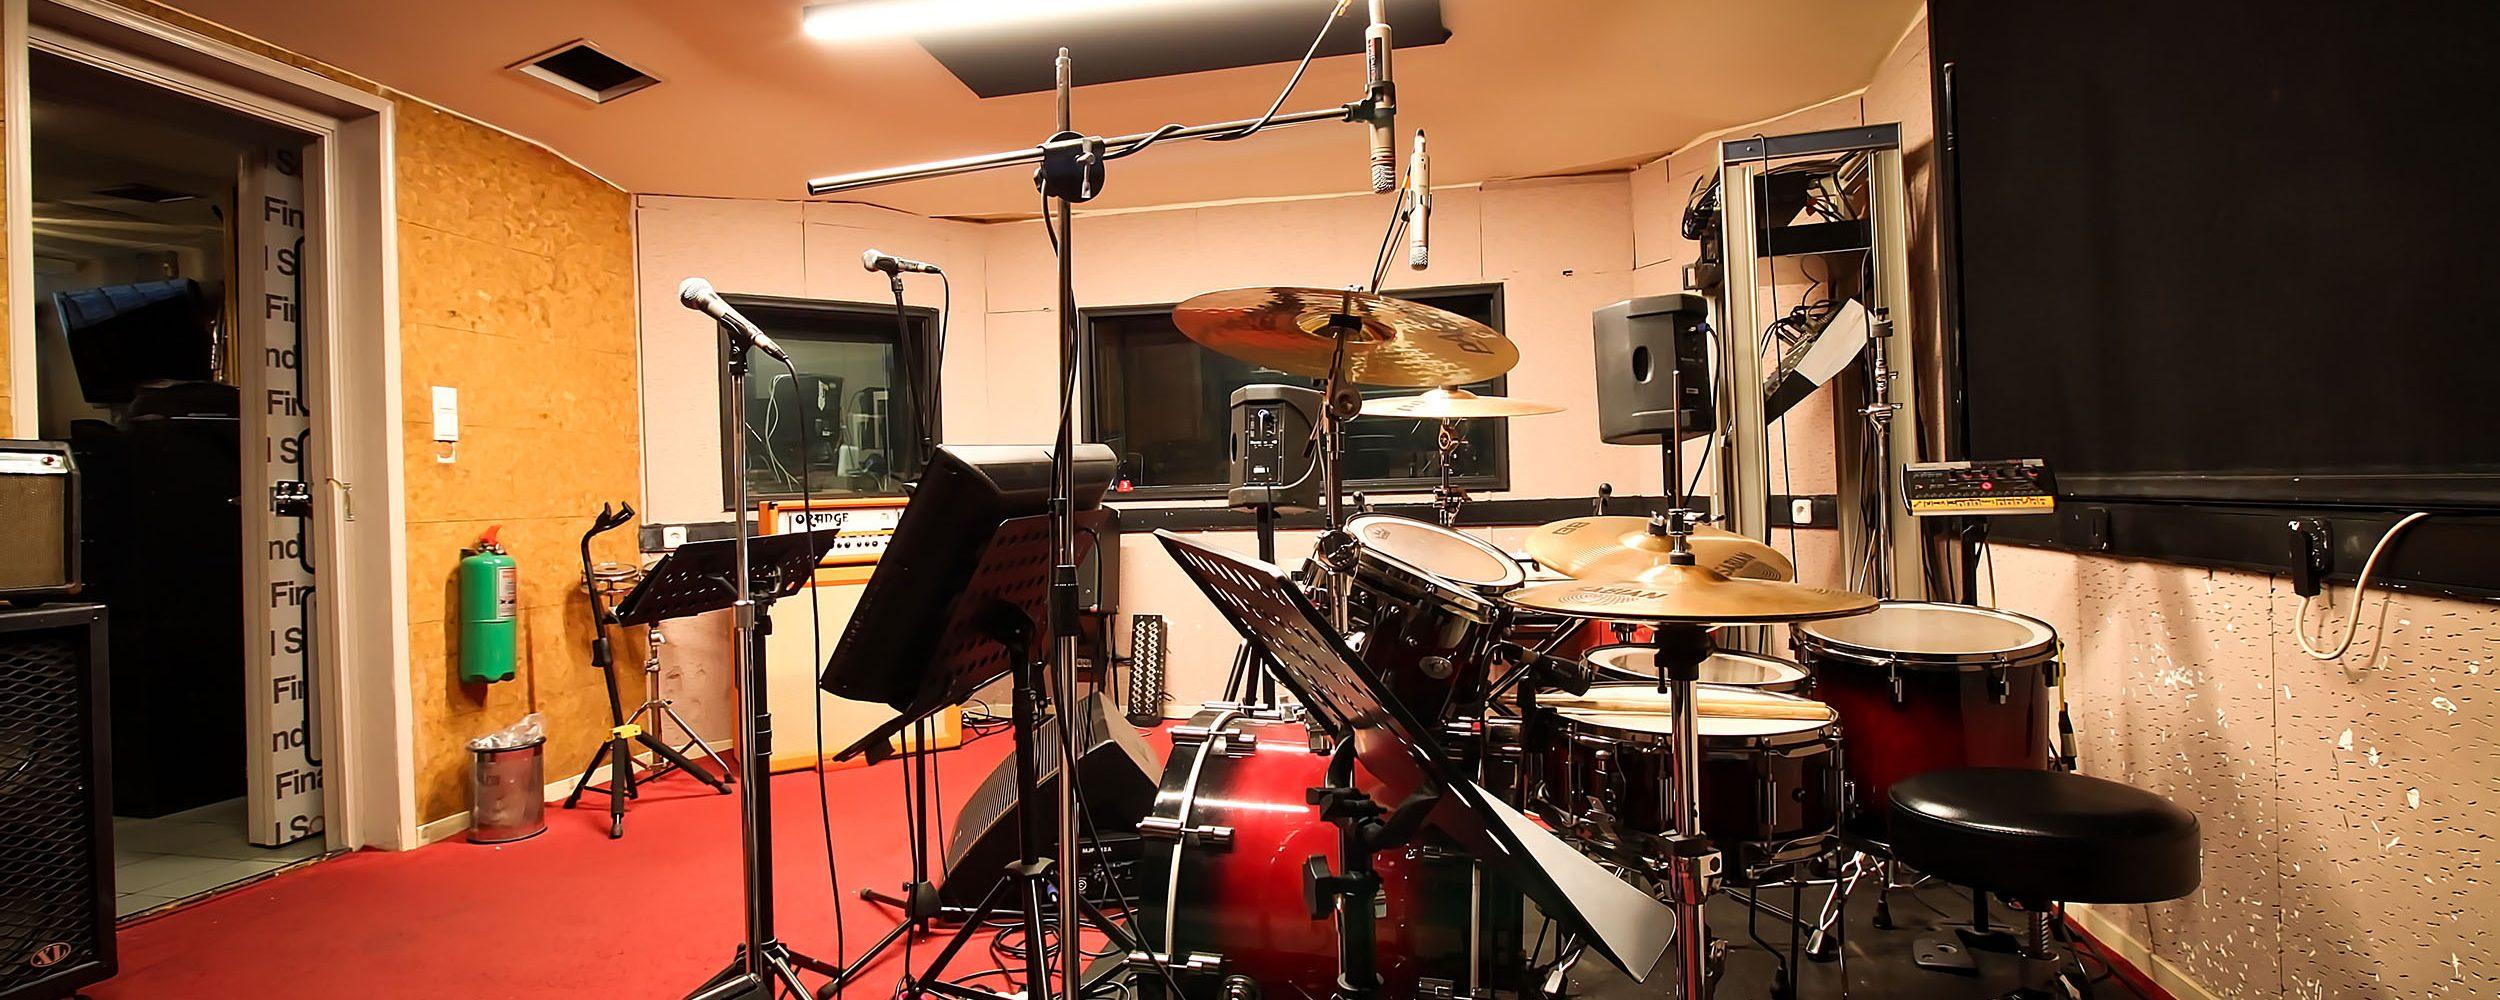 Final Sound Rehearsal 07